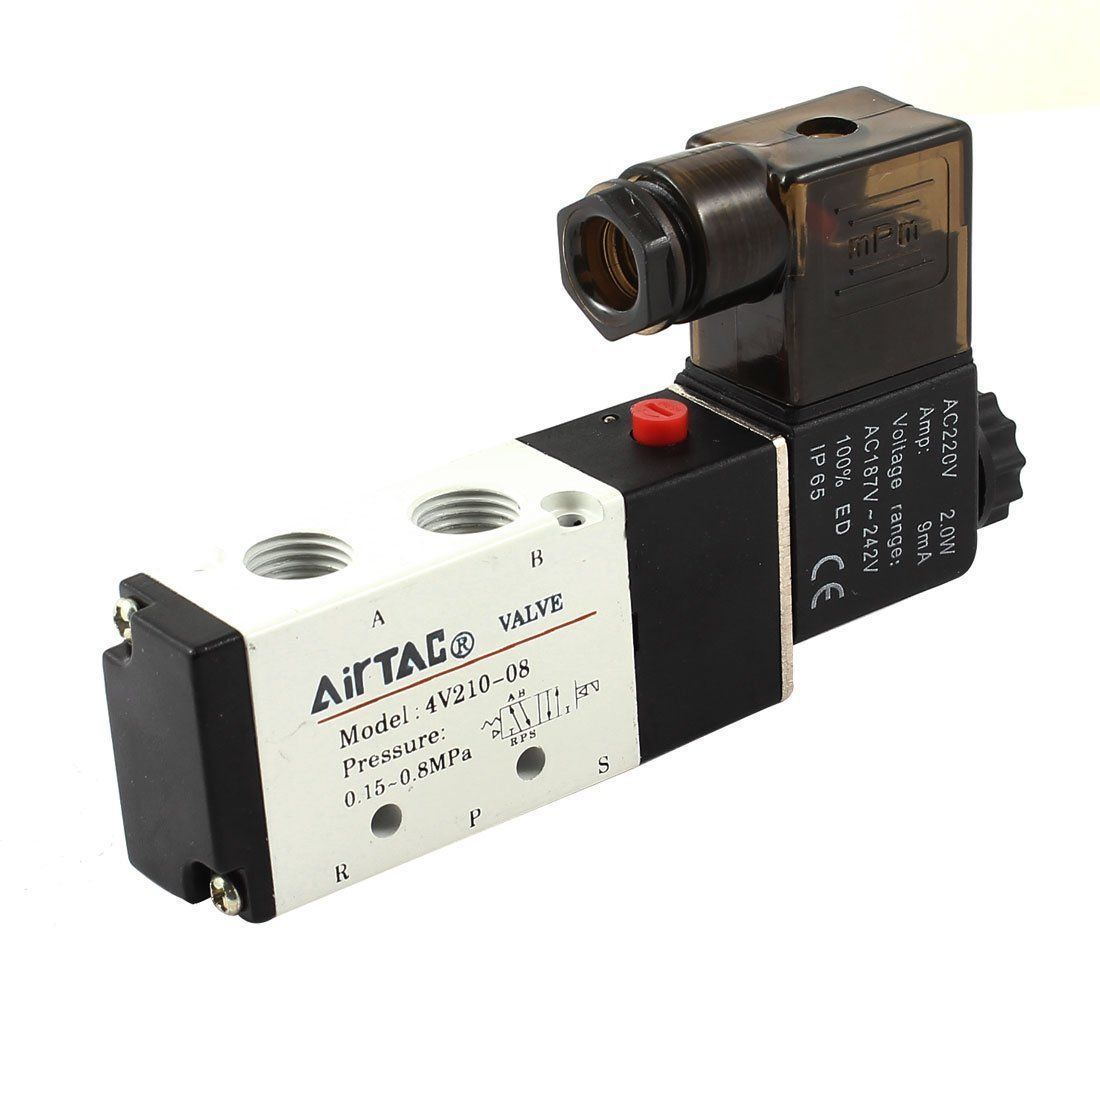 4v210 08 dc24v air valve 5 port 4 way 2 position solenoid for Air motors and drives llc